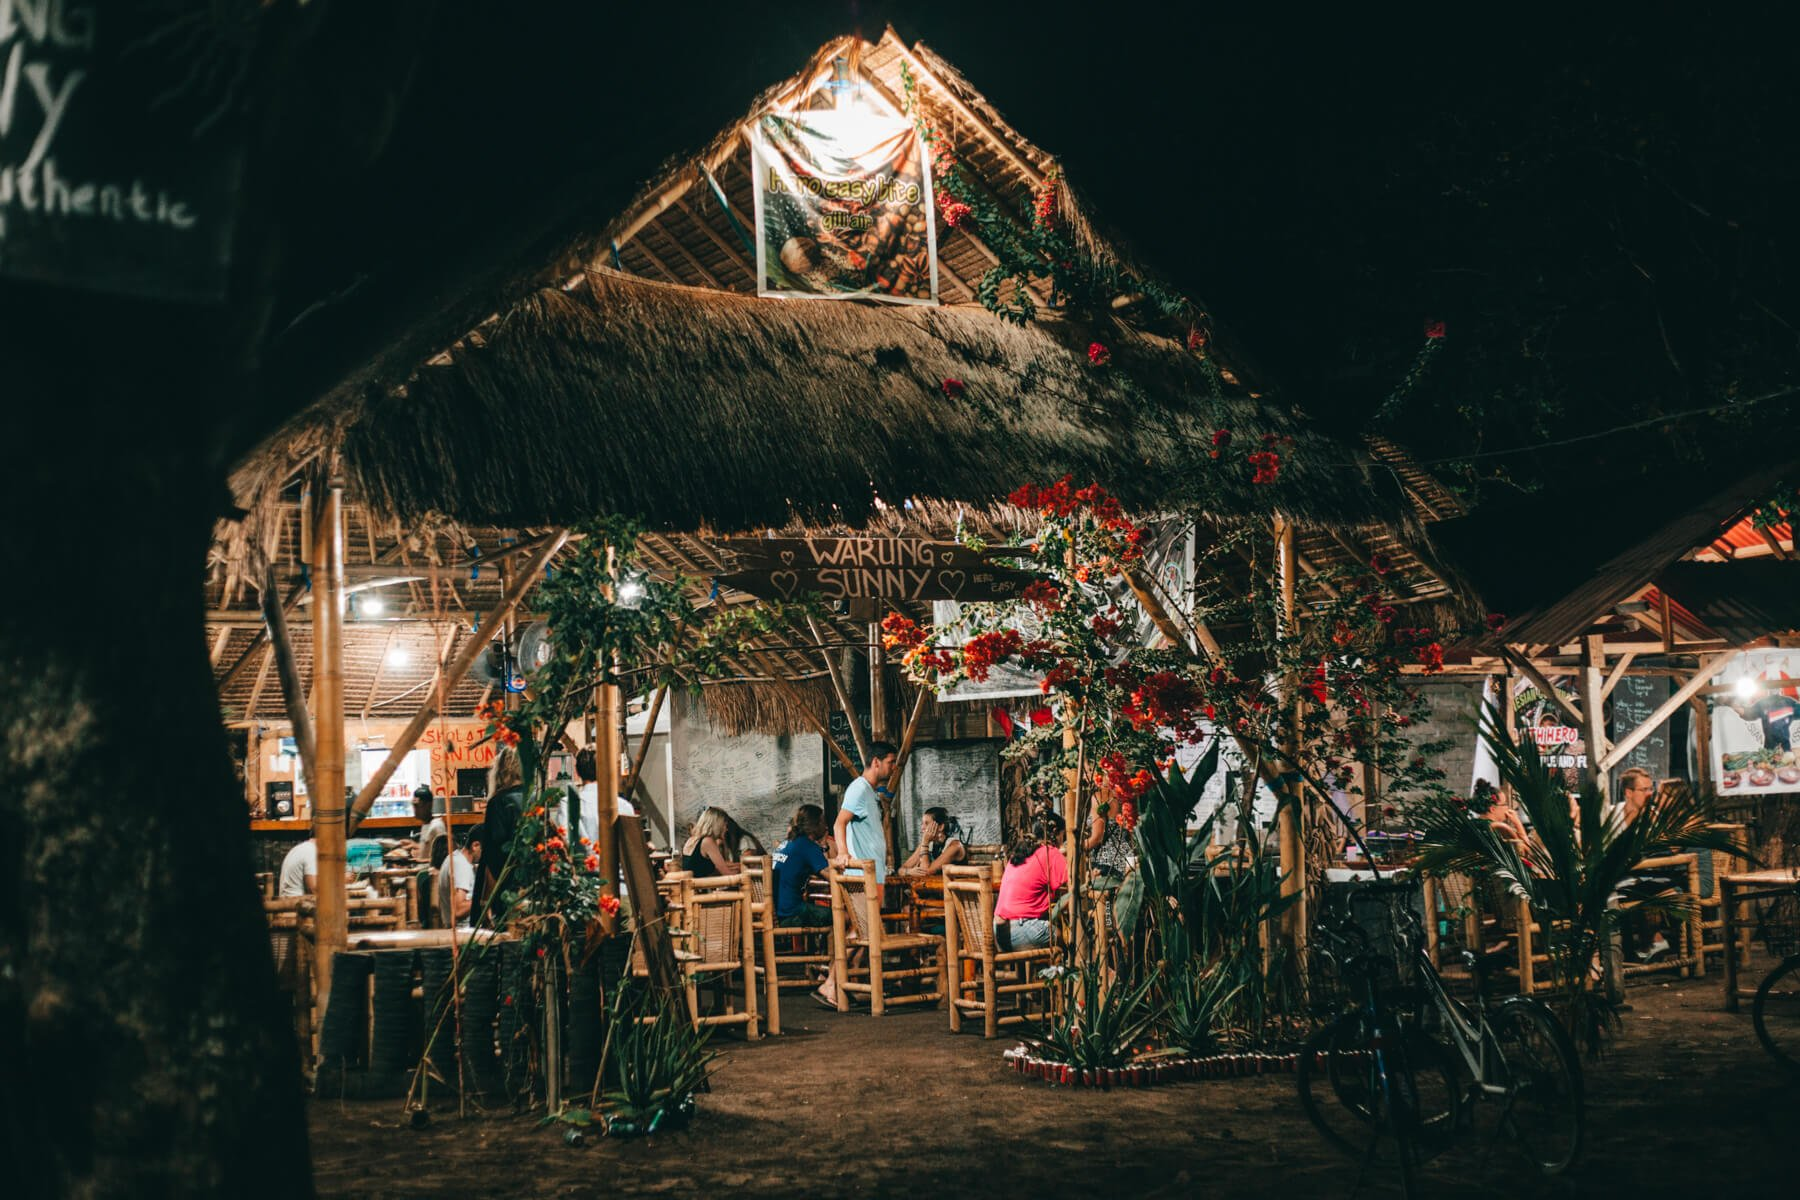 Ilhas Gili, Indonésia - Warung Sunny, em Gili Air